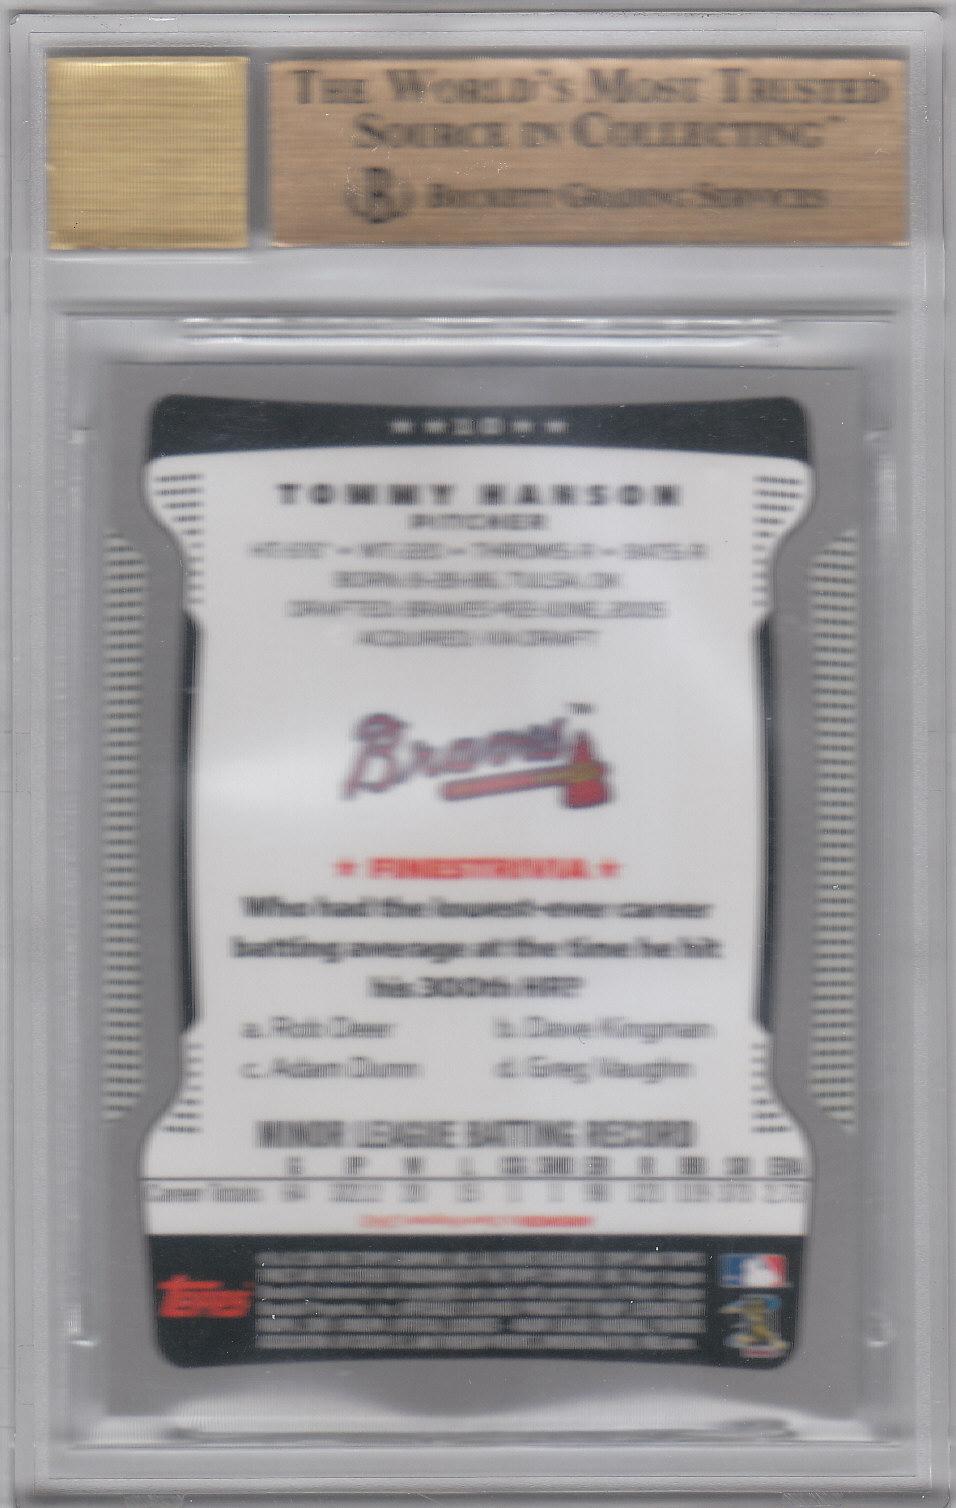 2009 Finest Rookie Redemption #10 Tommy Hanson AU back image